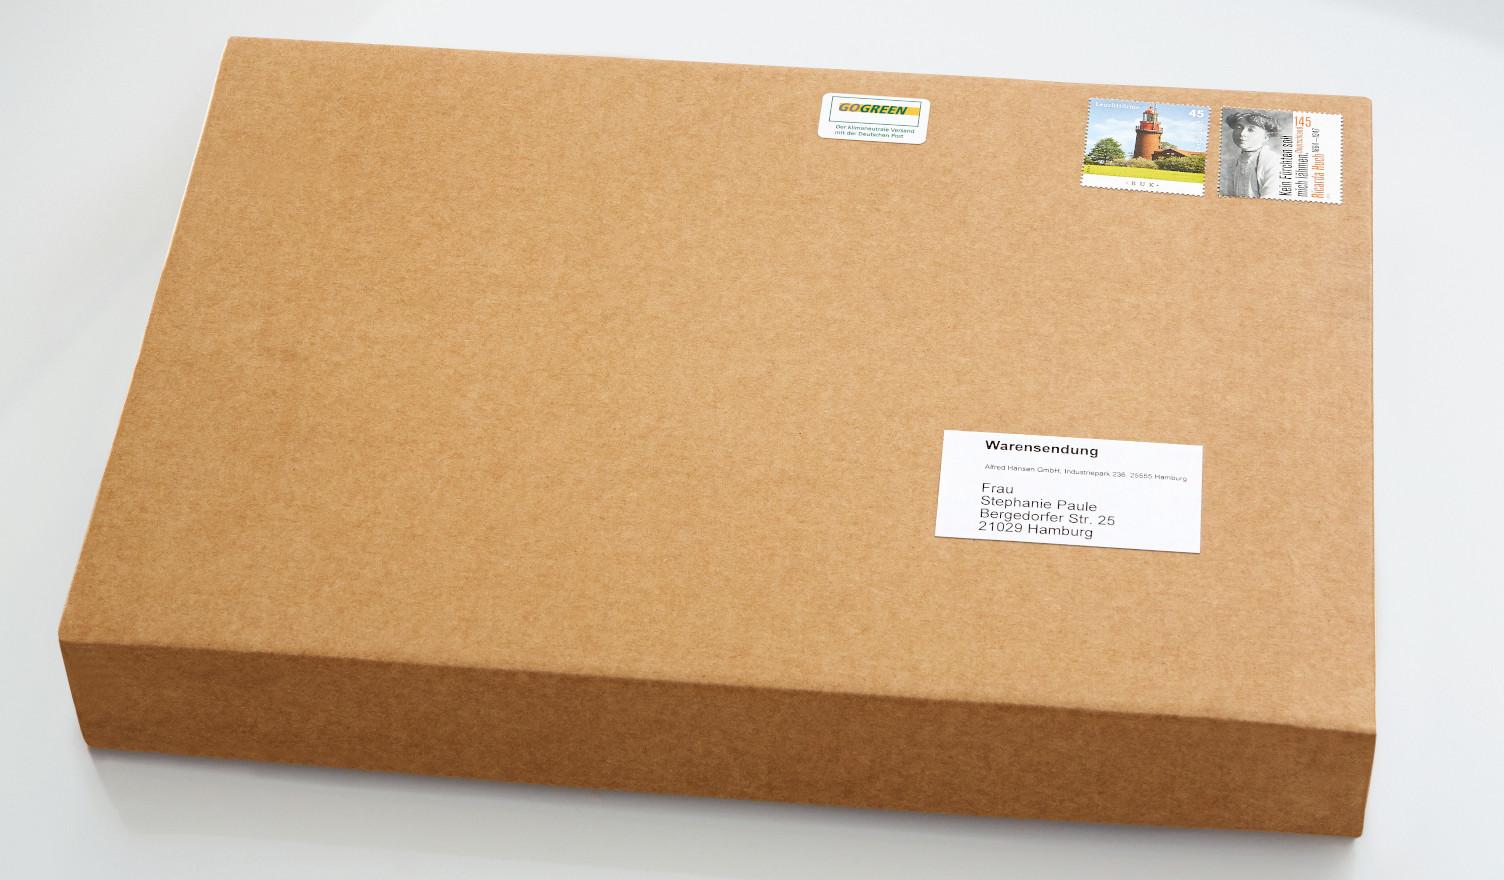 Warensendung Richtig Verpacken Verschliessen ᐅ So Geht S 14